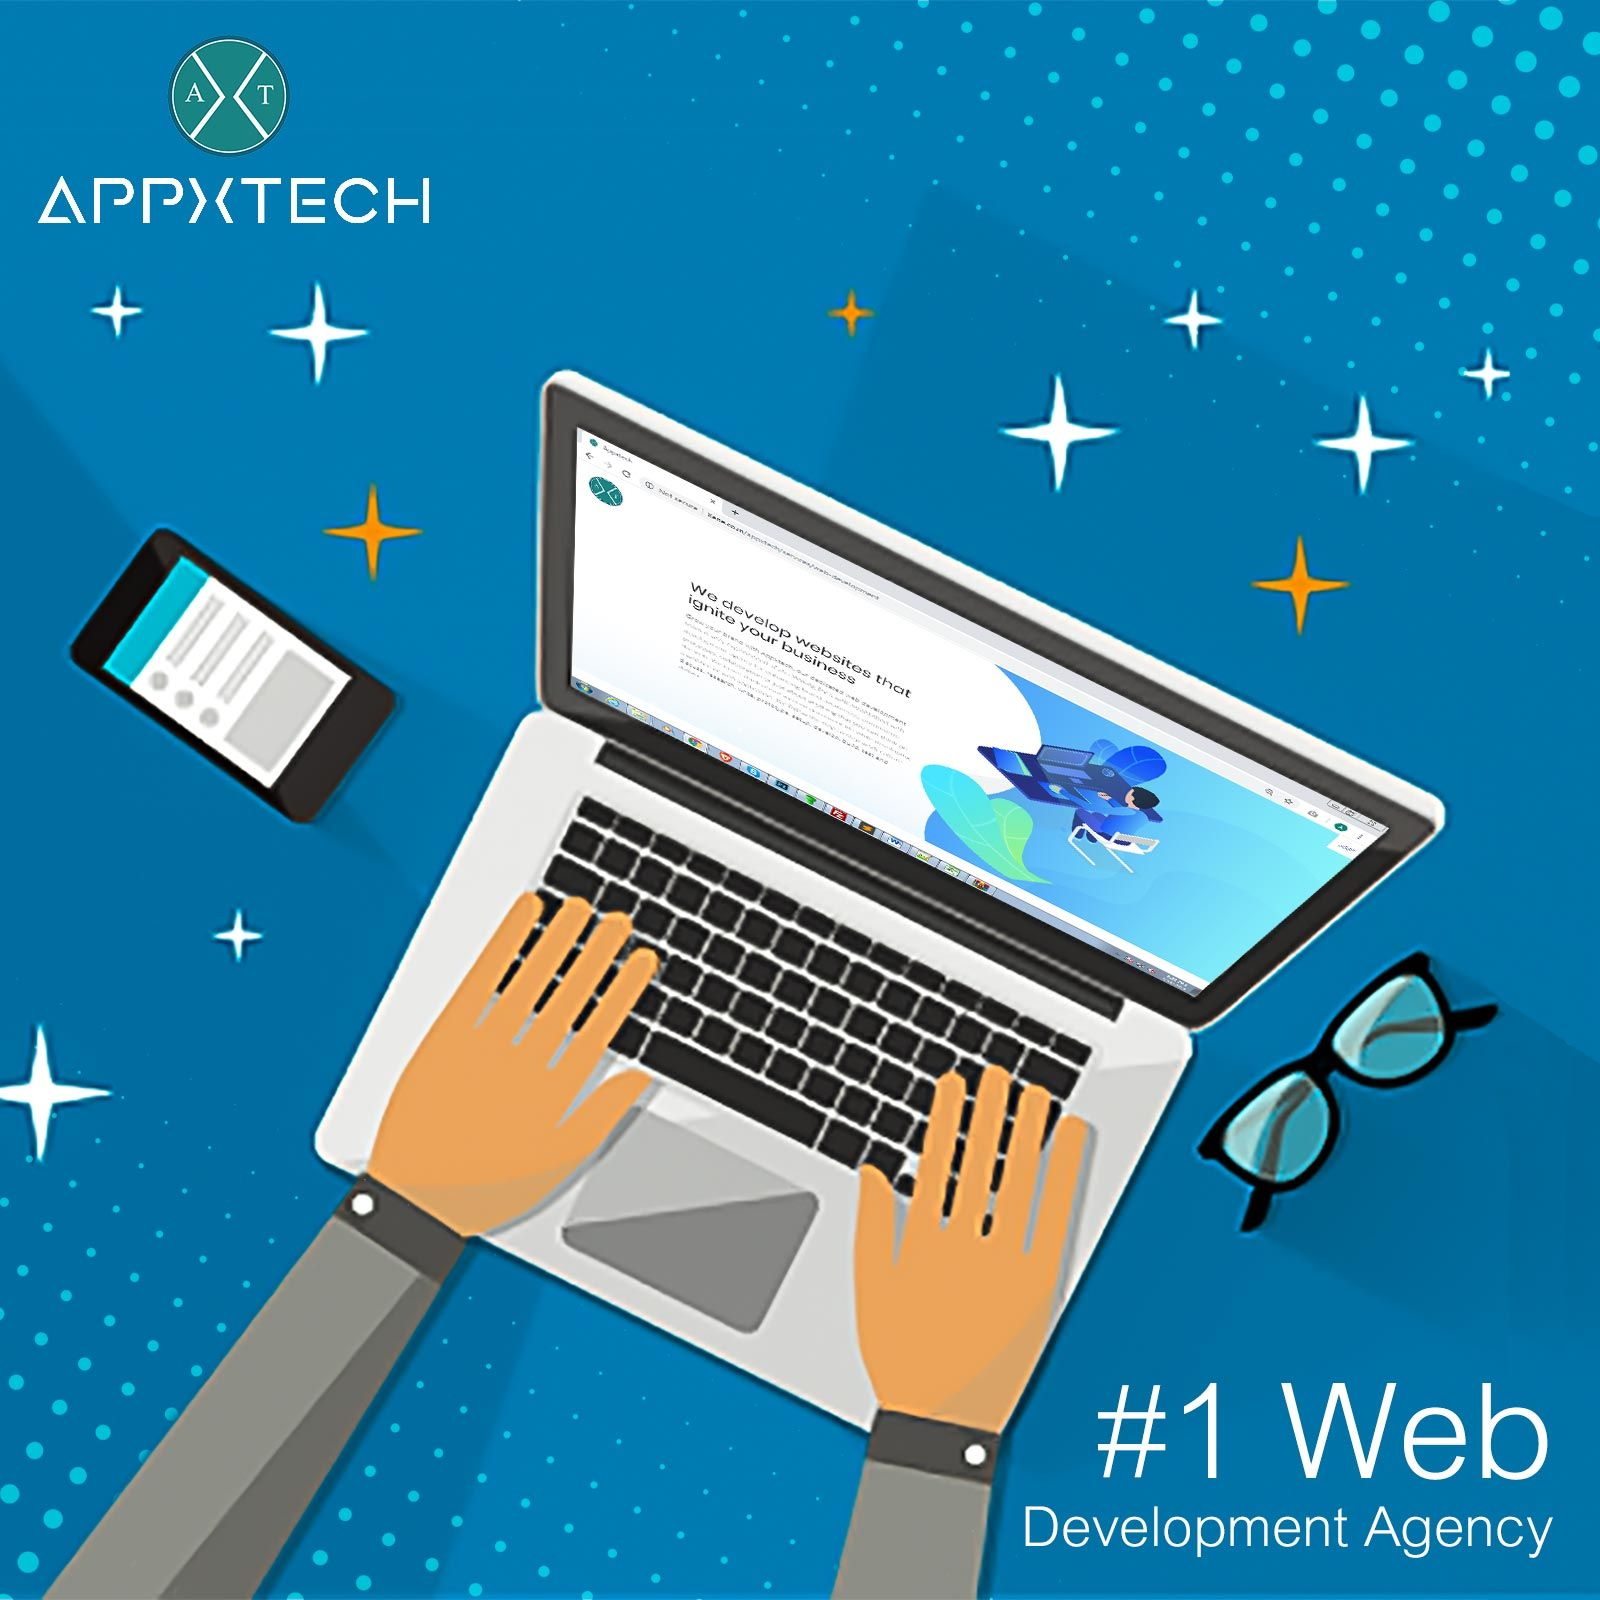 Web Designing And Development Company Usa Appxtech Web Development Web Development Agency Development